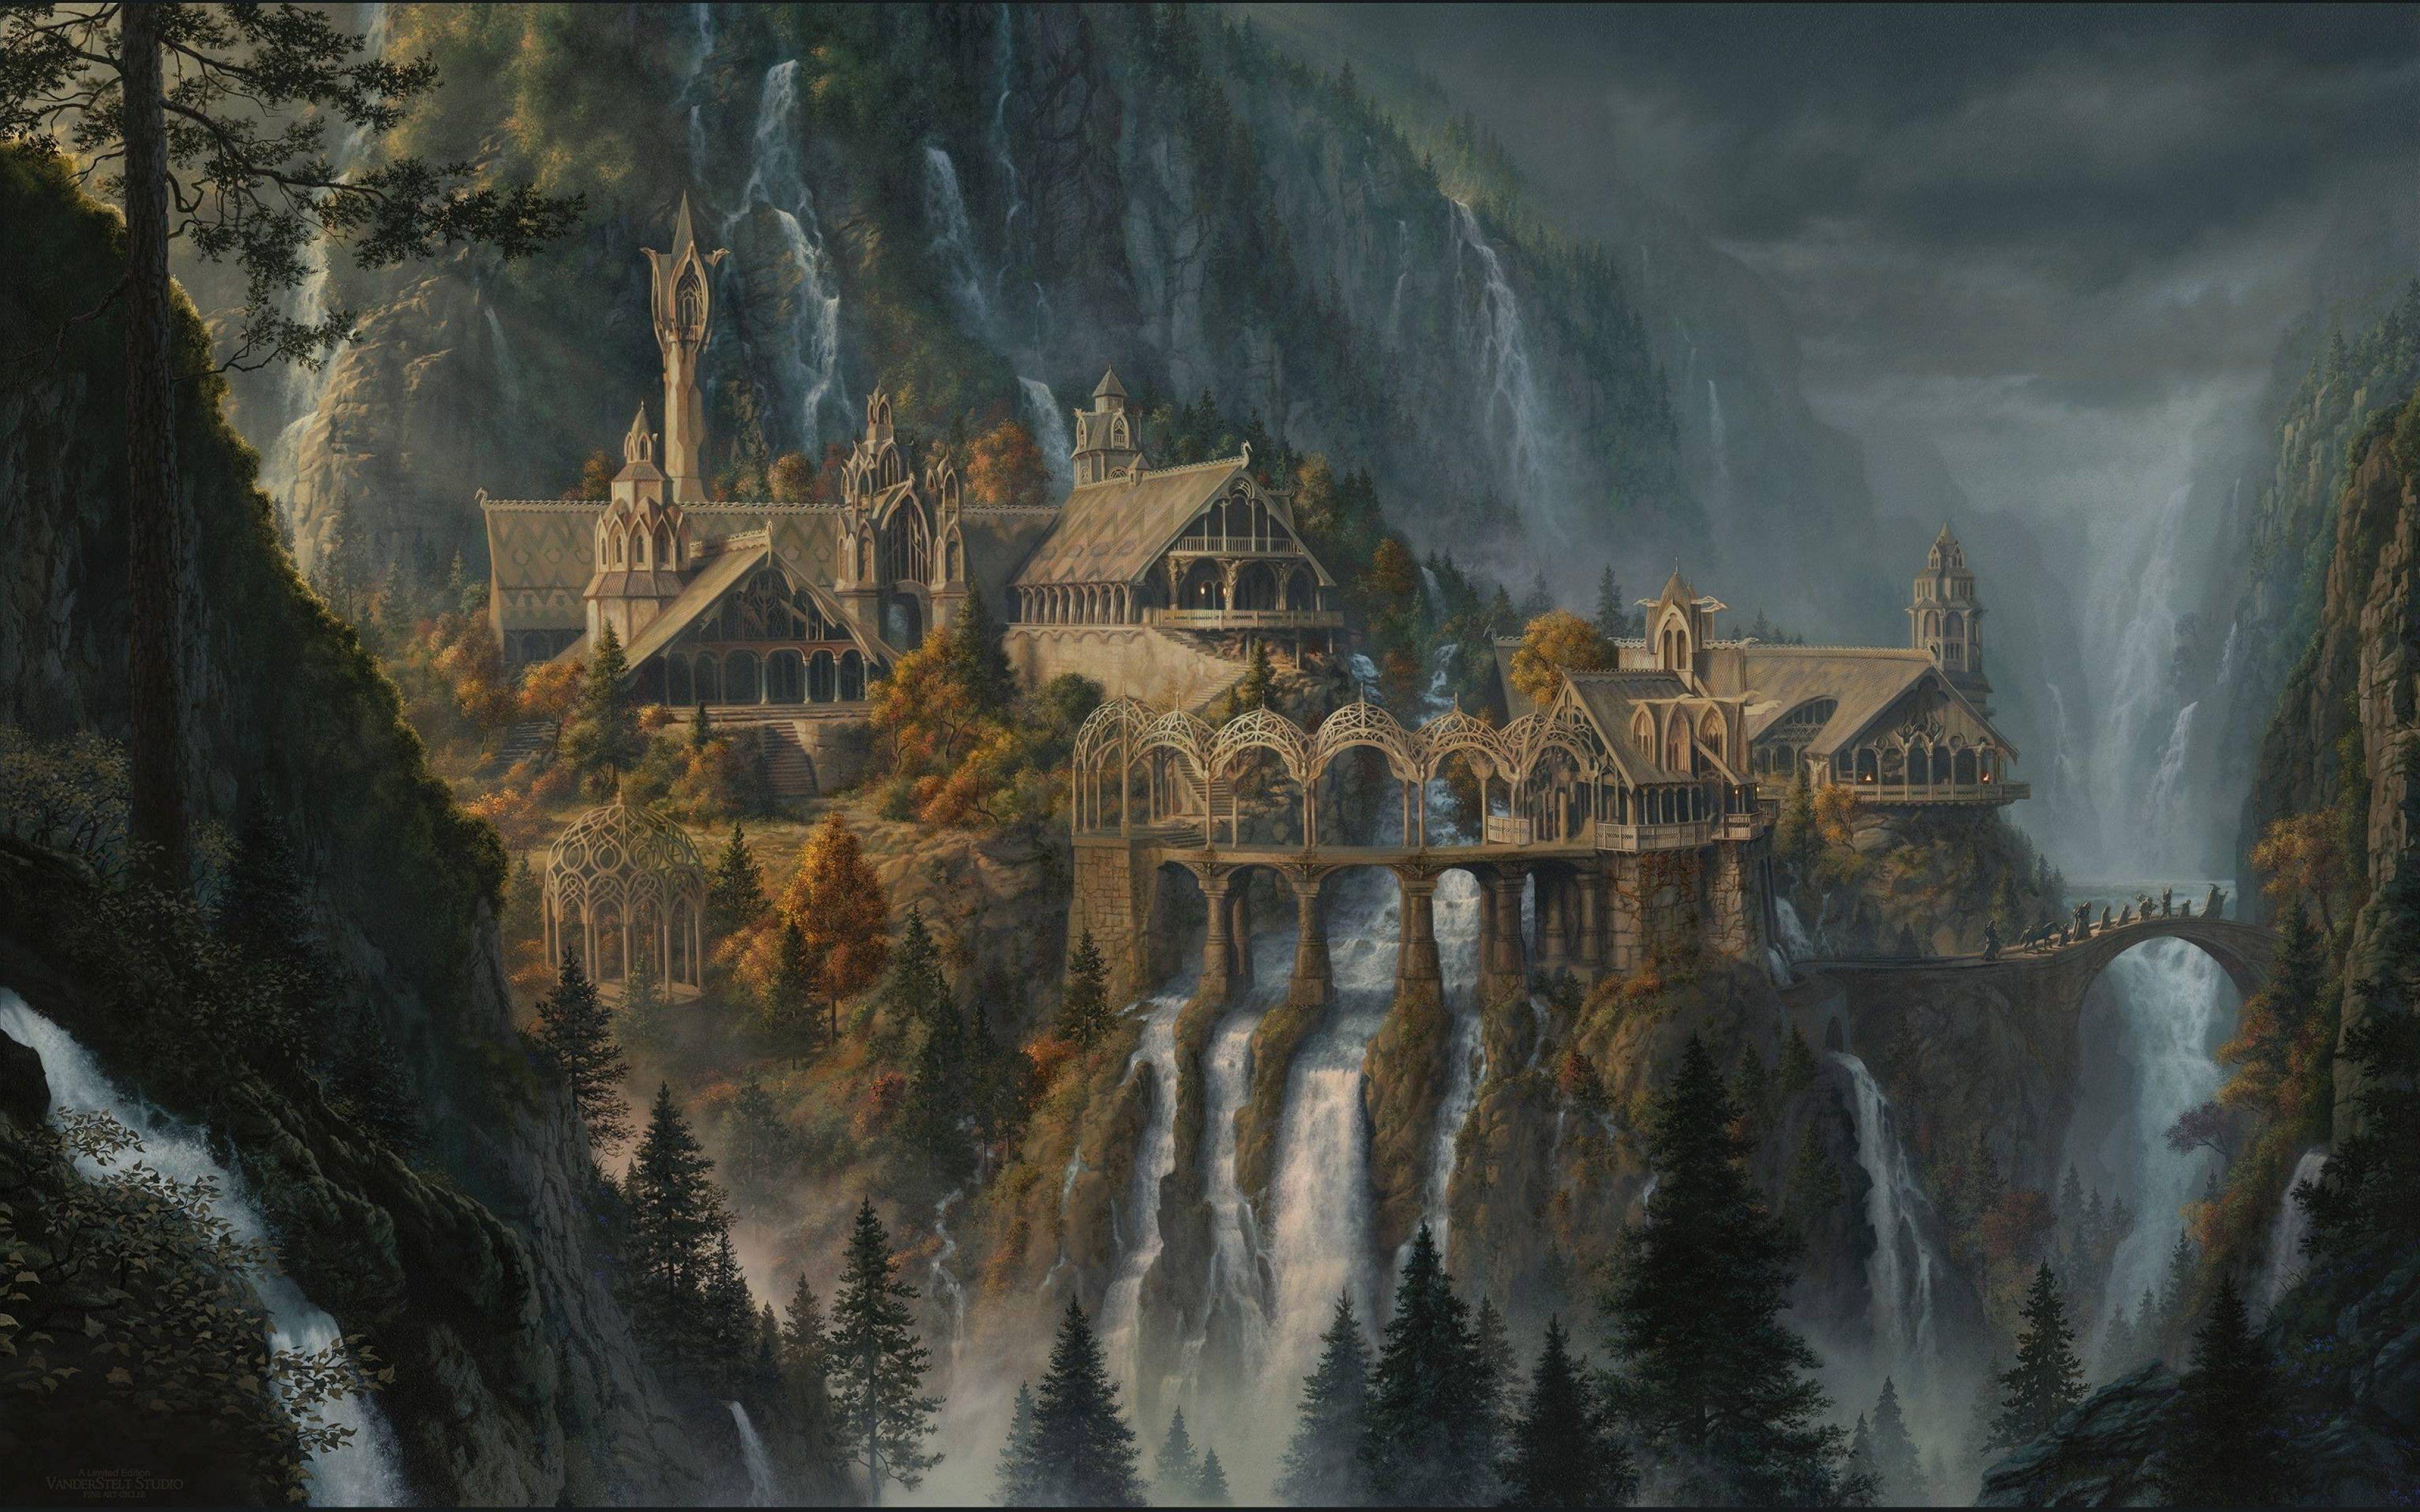 3840x2130 Hobbit 4k Best Hd Wallpaper For Pc Free Download The Hobbit Hobbit An Unexpected Journey Movie Adaptation